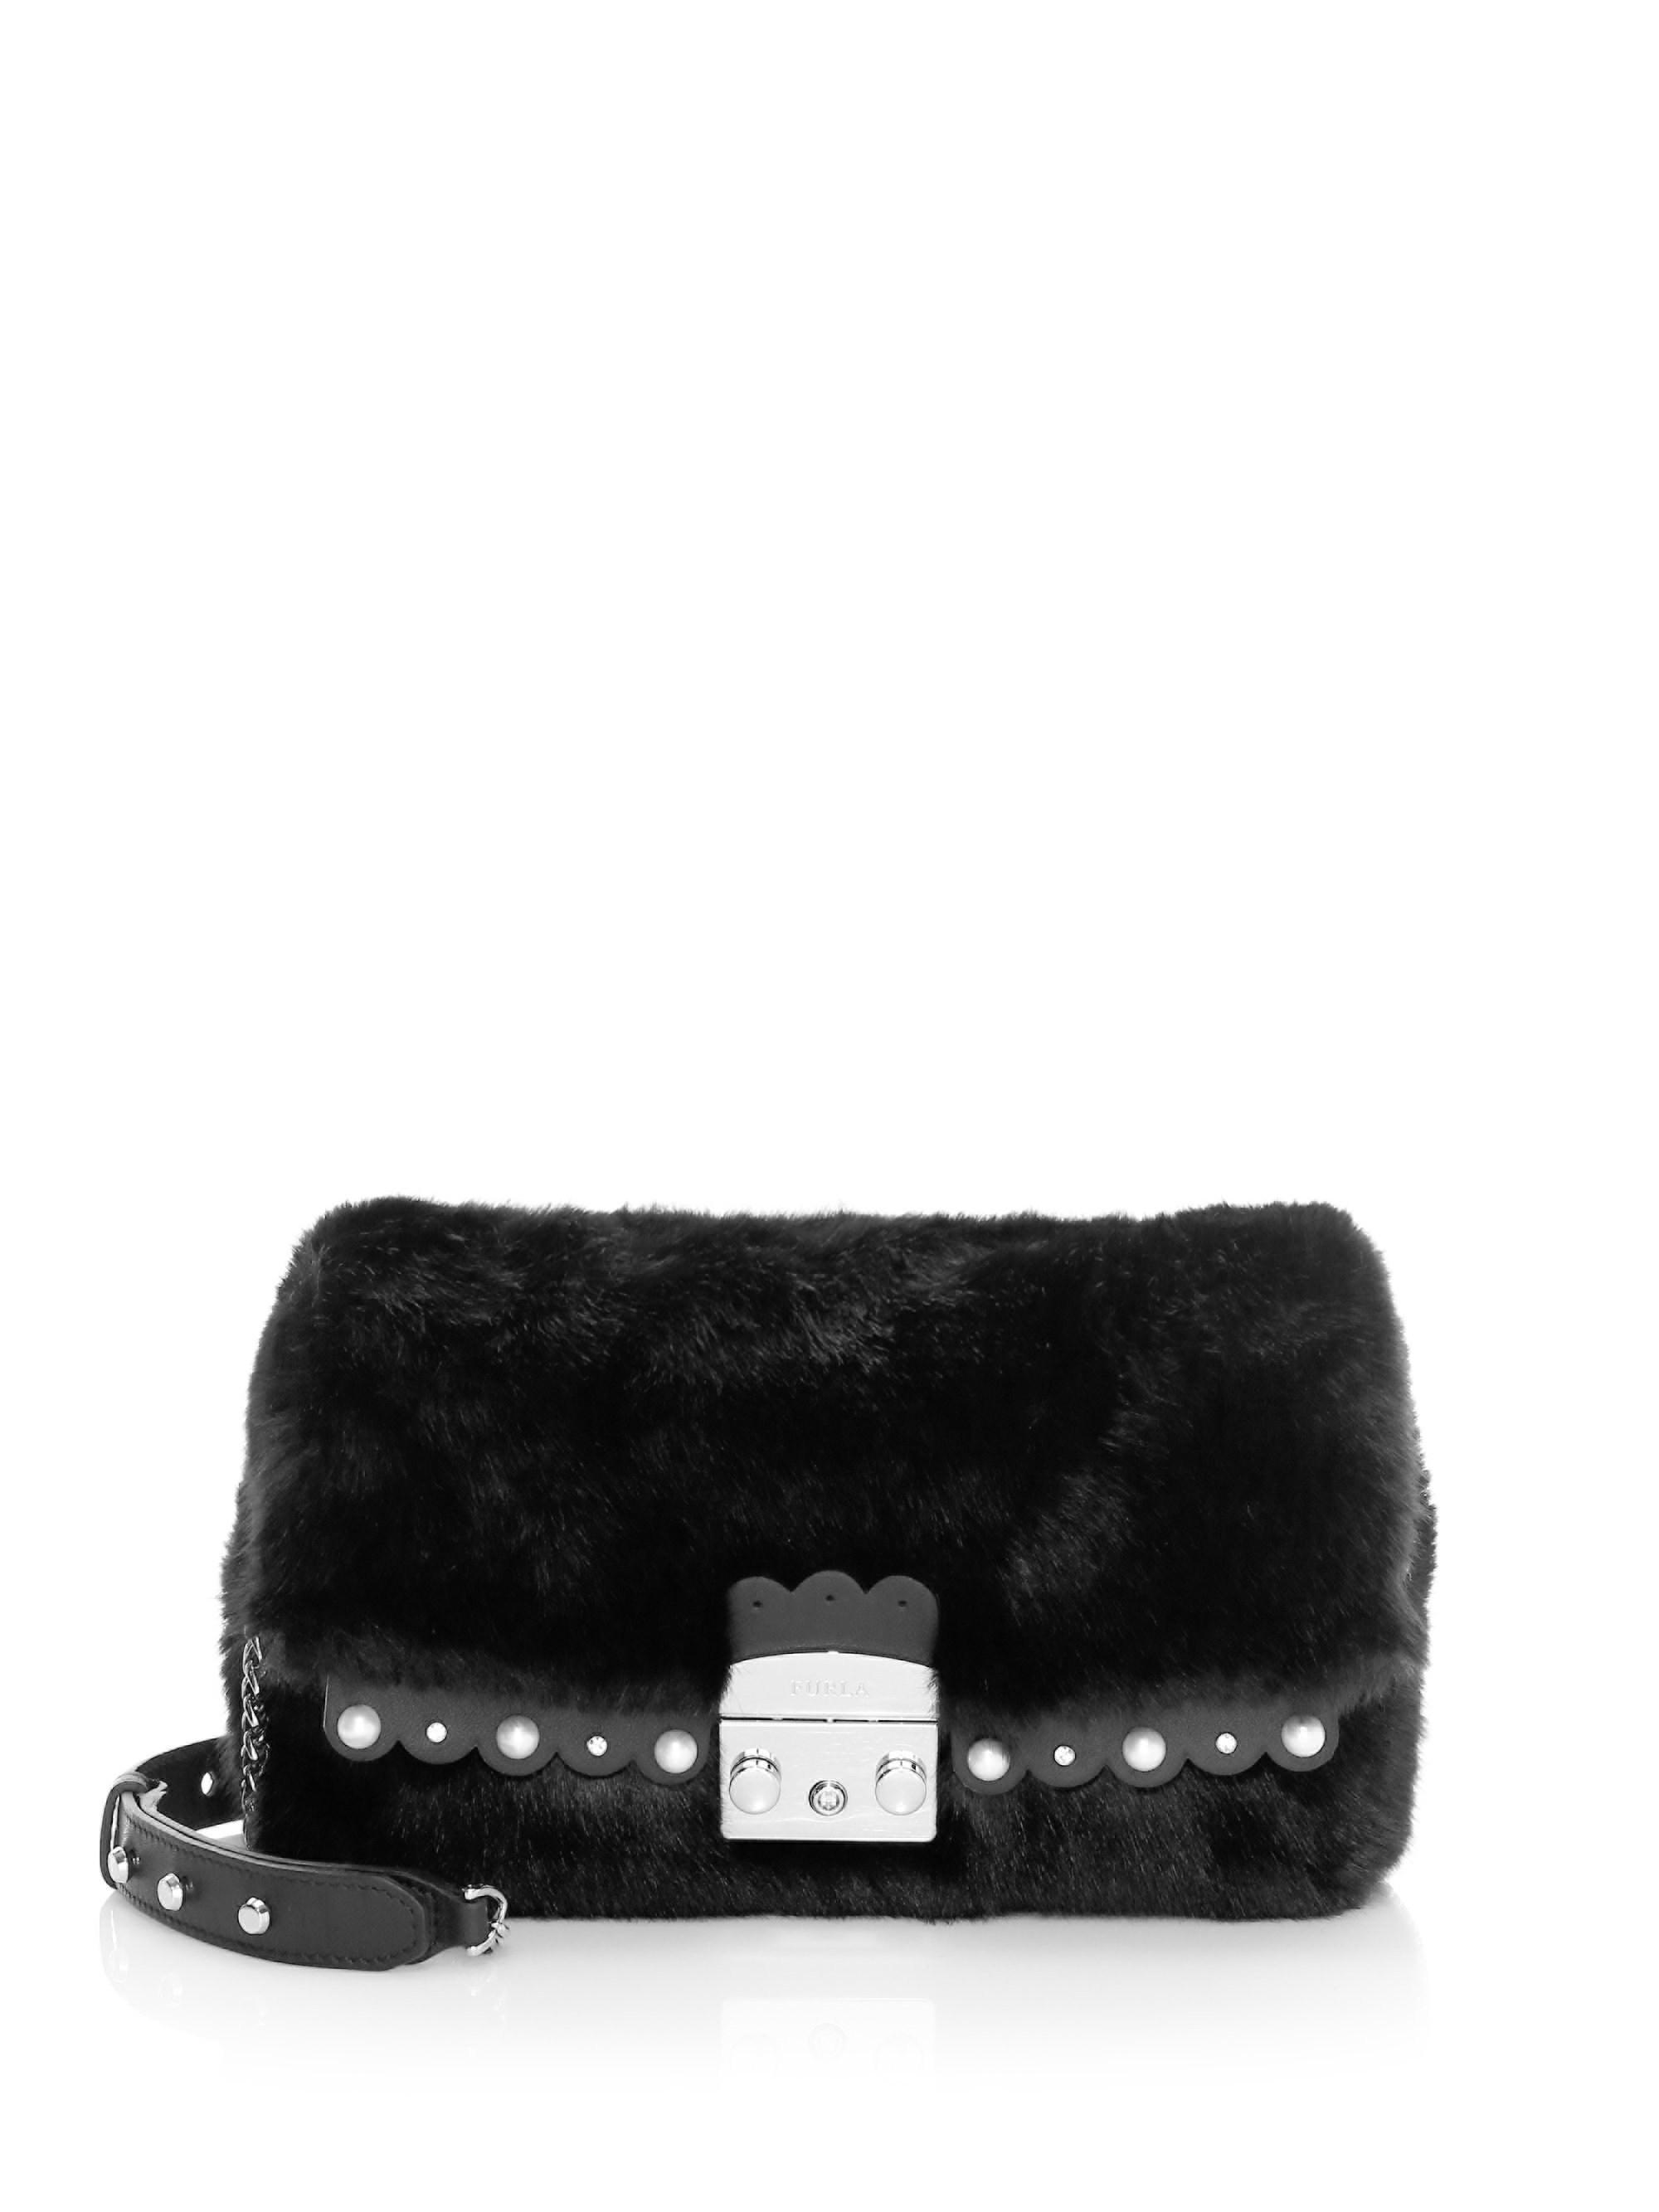 Lyst - Furla Women s Small Metropolis Nuvola Faux Fur Shoulder Bag ... 5bb296f324821